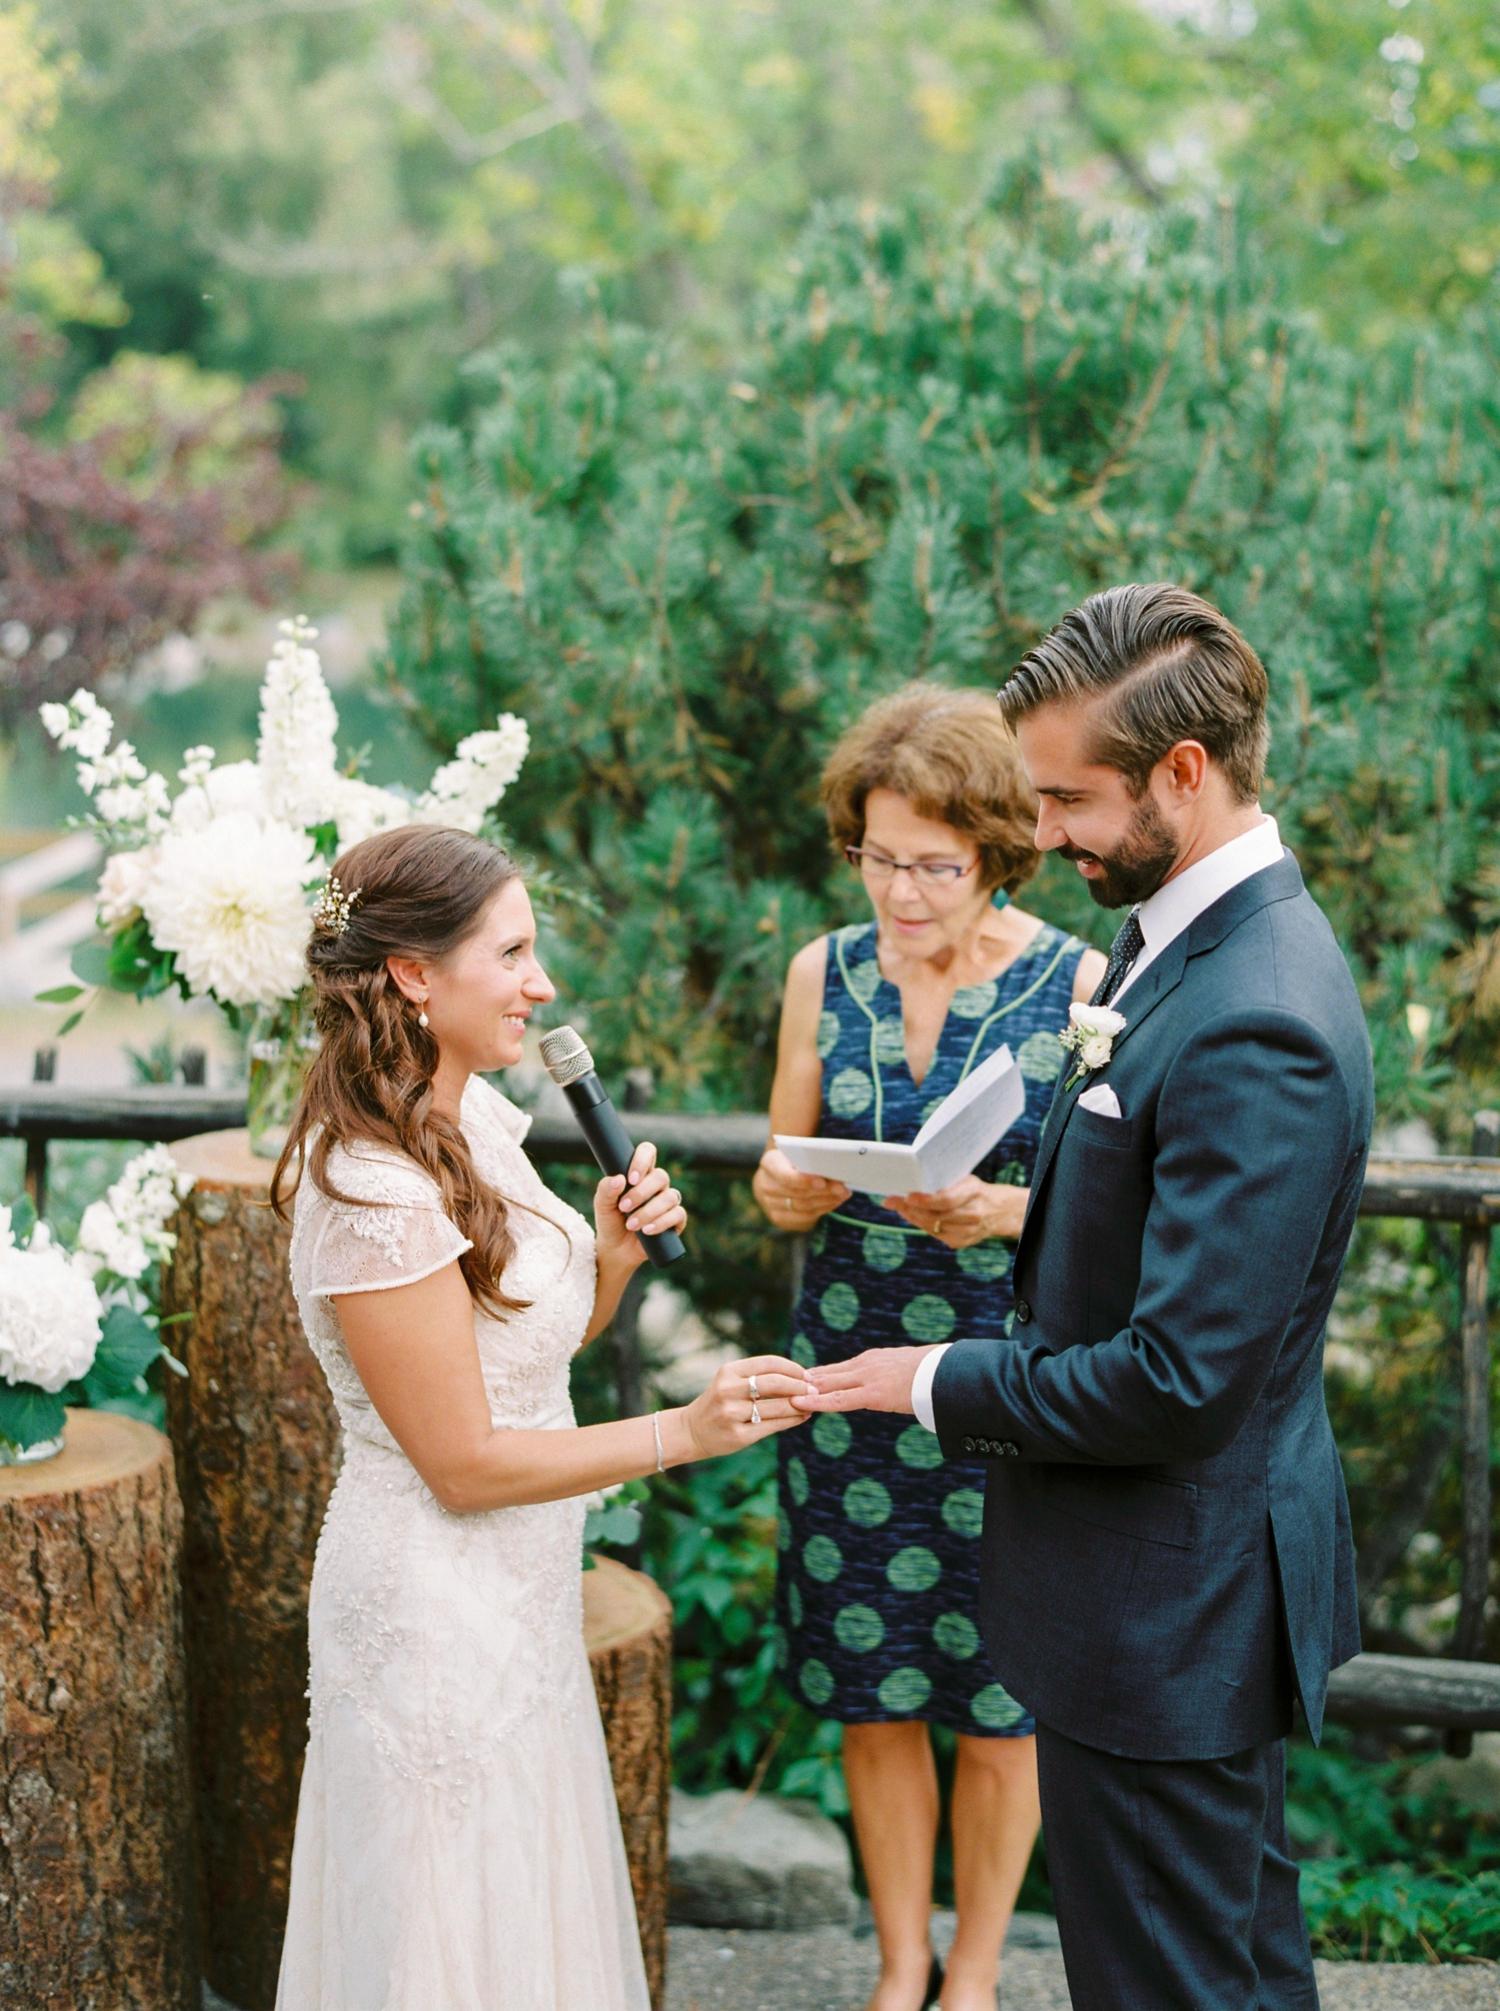 Calgary wedding photographers | fine art film | Justine Milton Photography | wedding inspiration | wedding chairs | wedding flowers | wedding ceremony | bride and groom | wedding vows